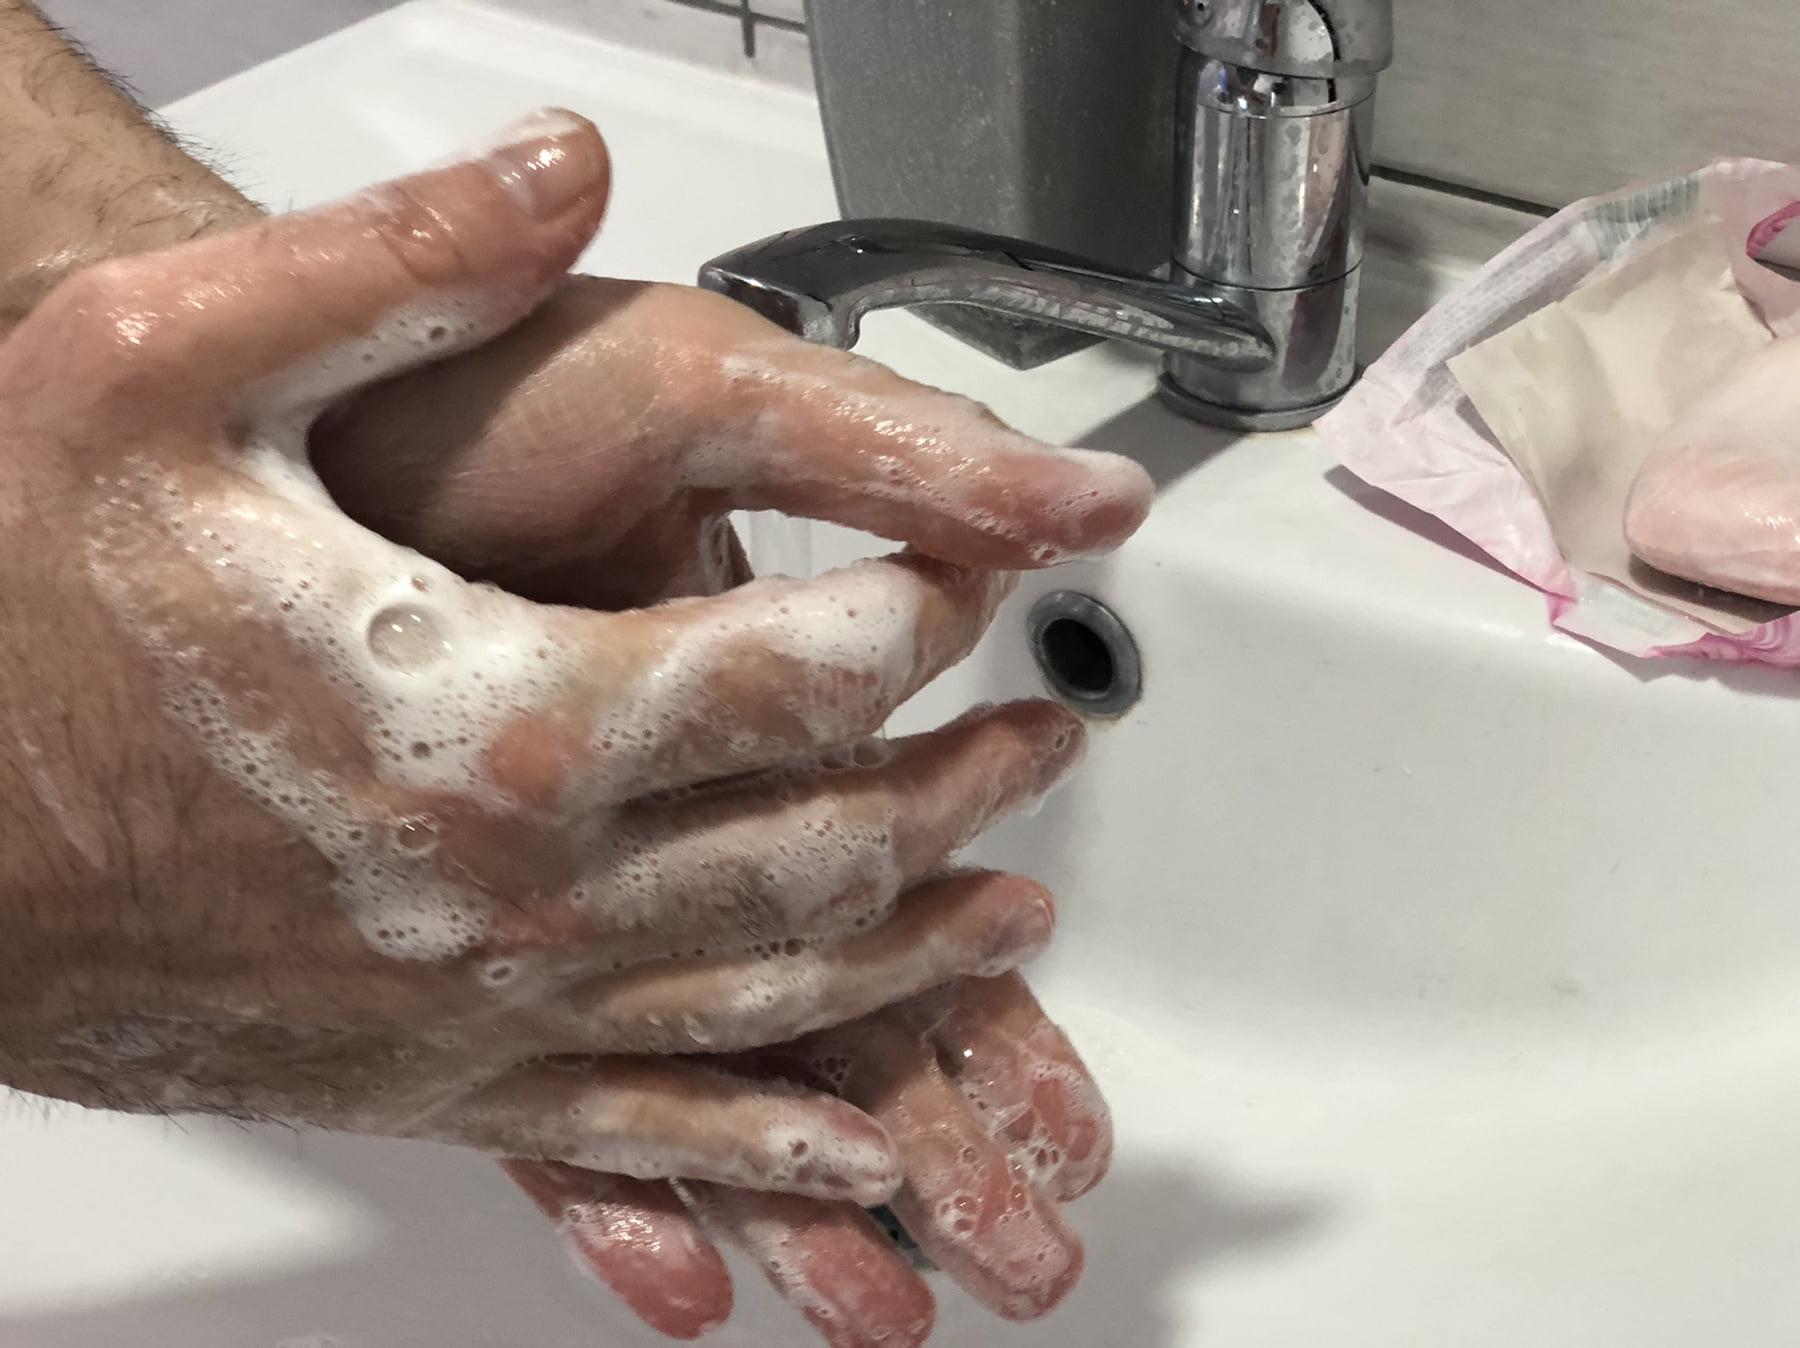 Pranje ruku, foto: RBS